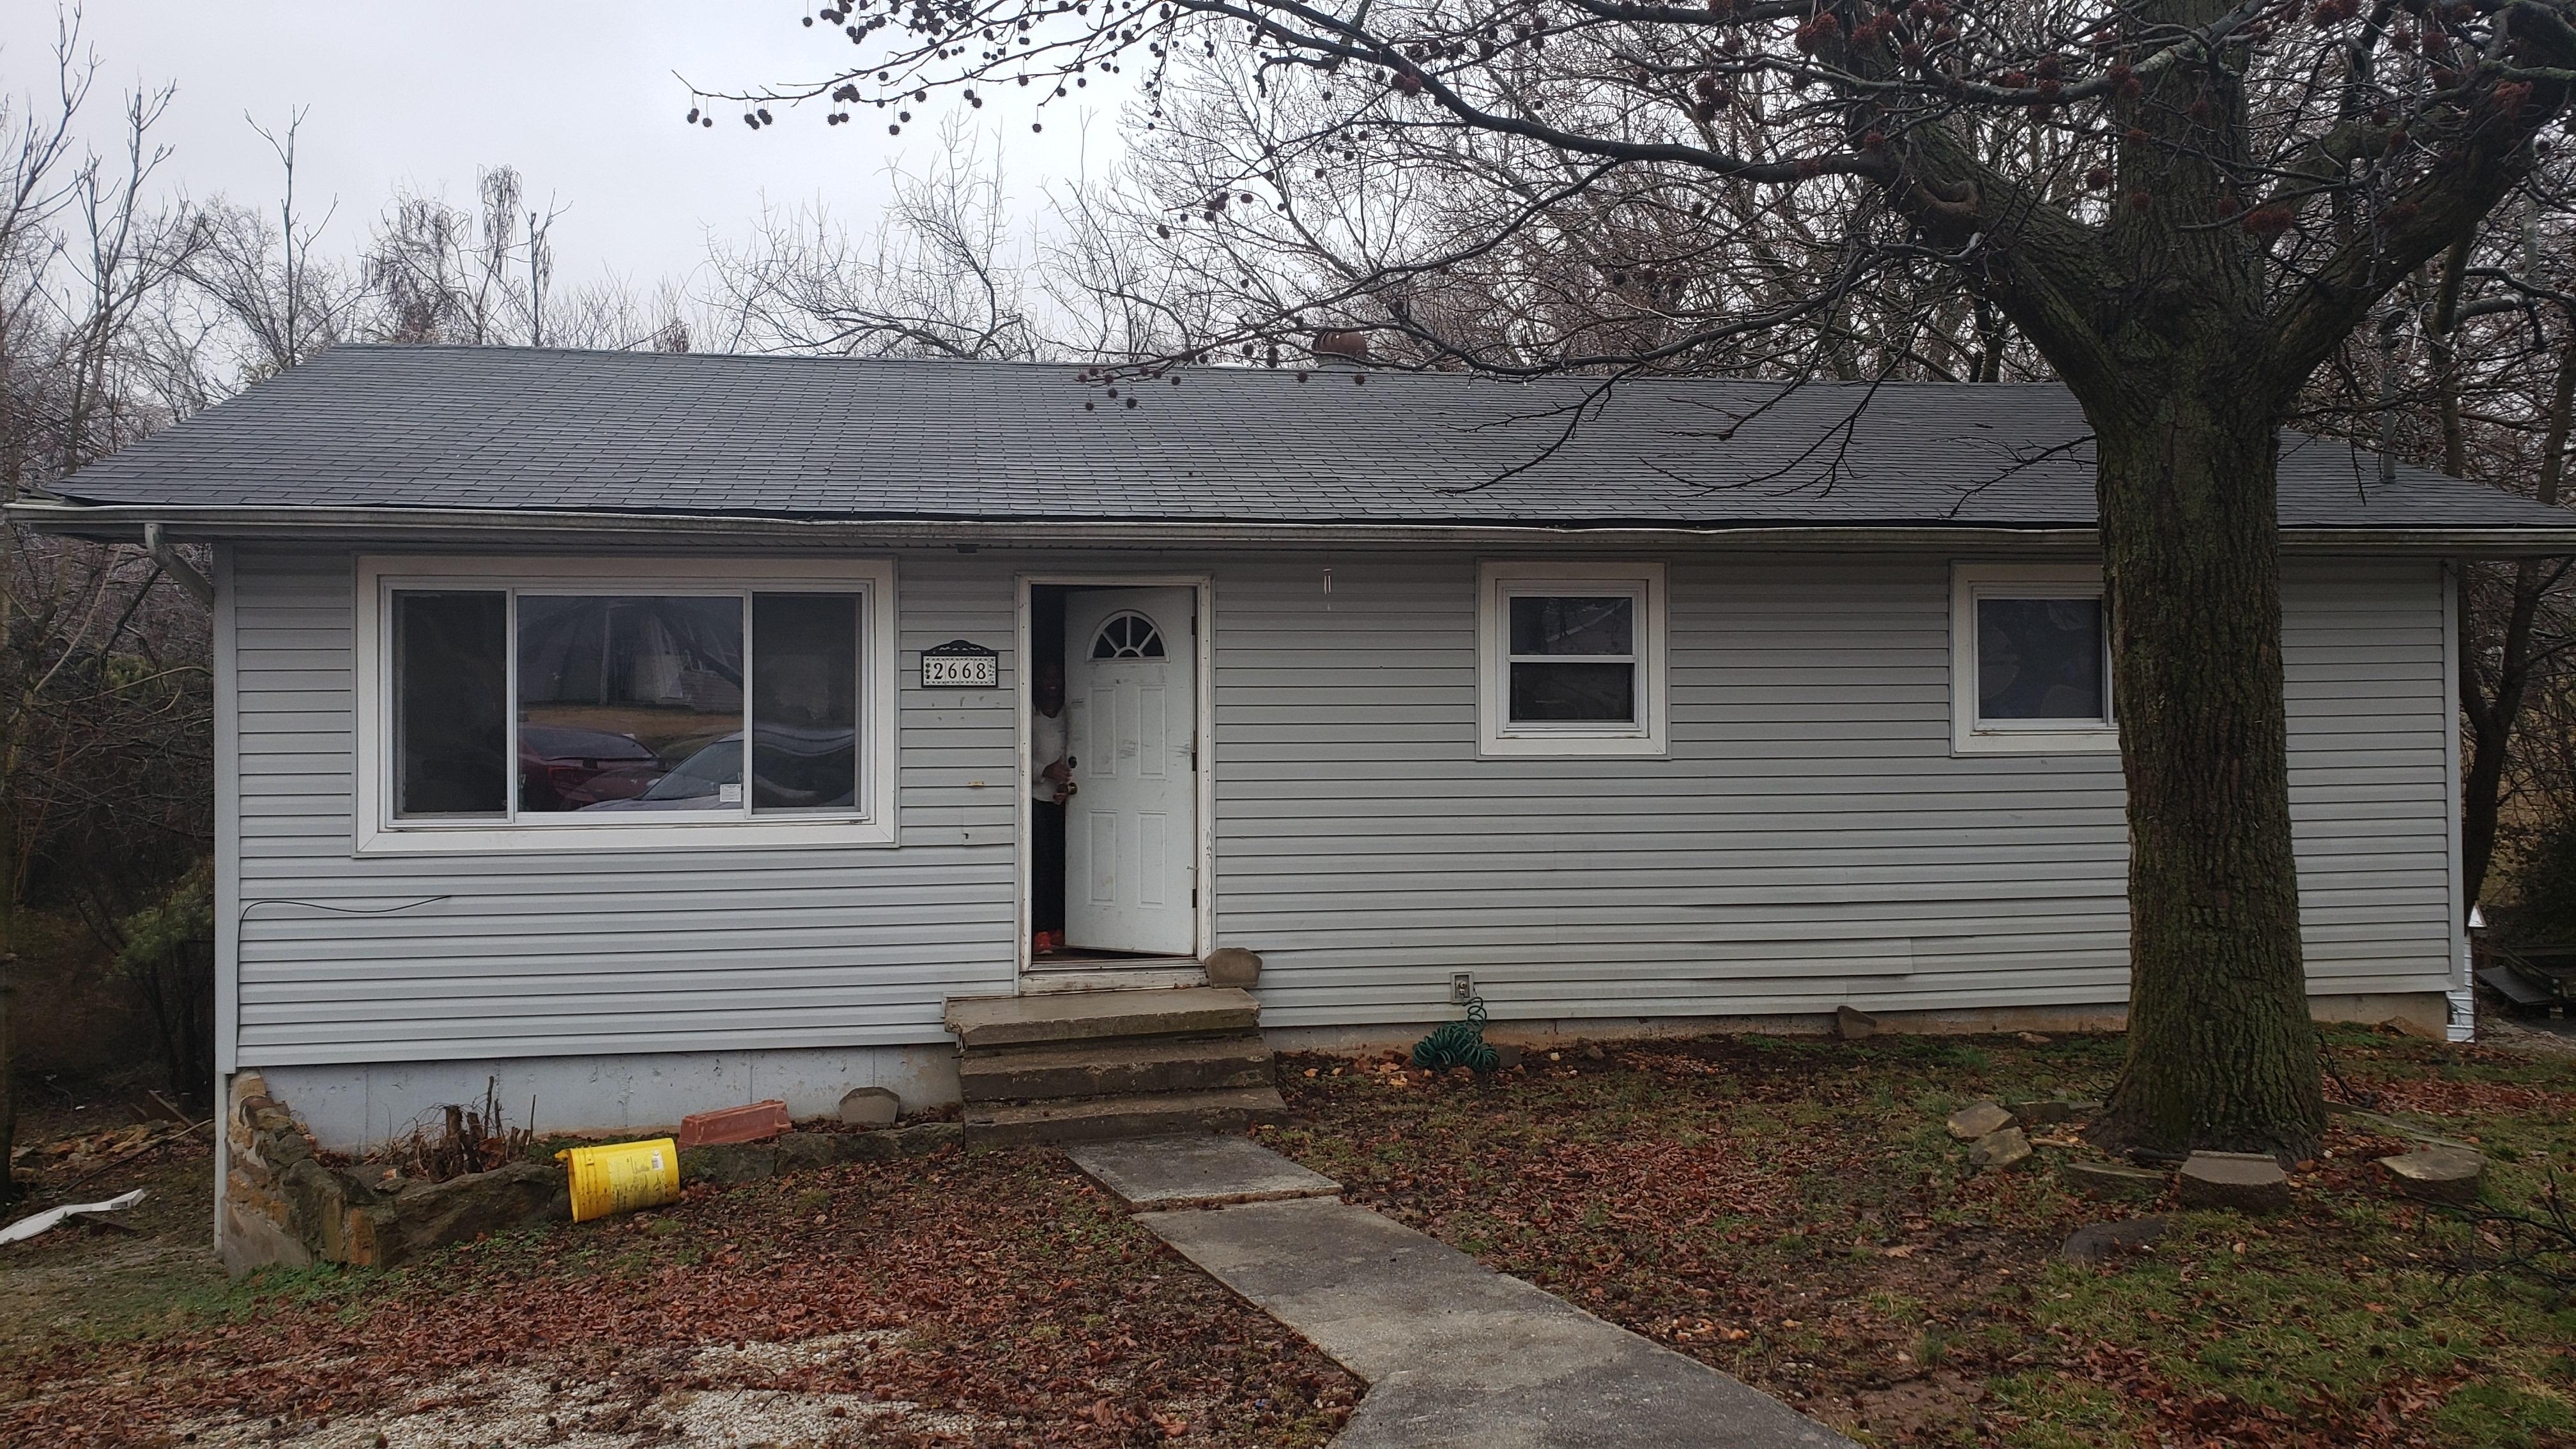 2668 N Johnston Ave, Springfield, MO